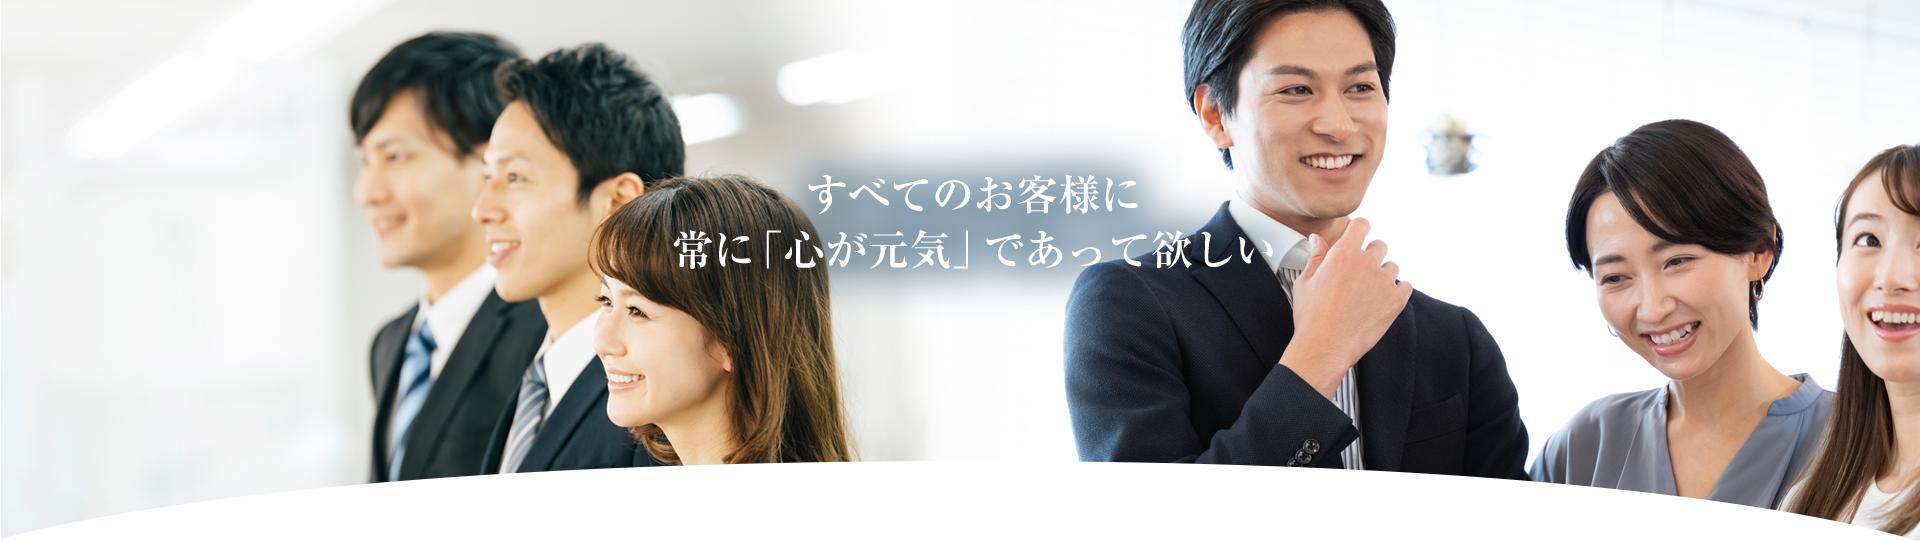 田町の税理士_葛西安寿税理士事務所メイン画像